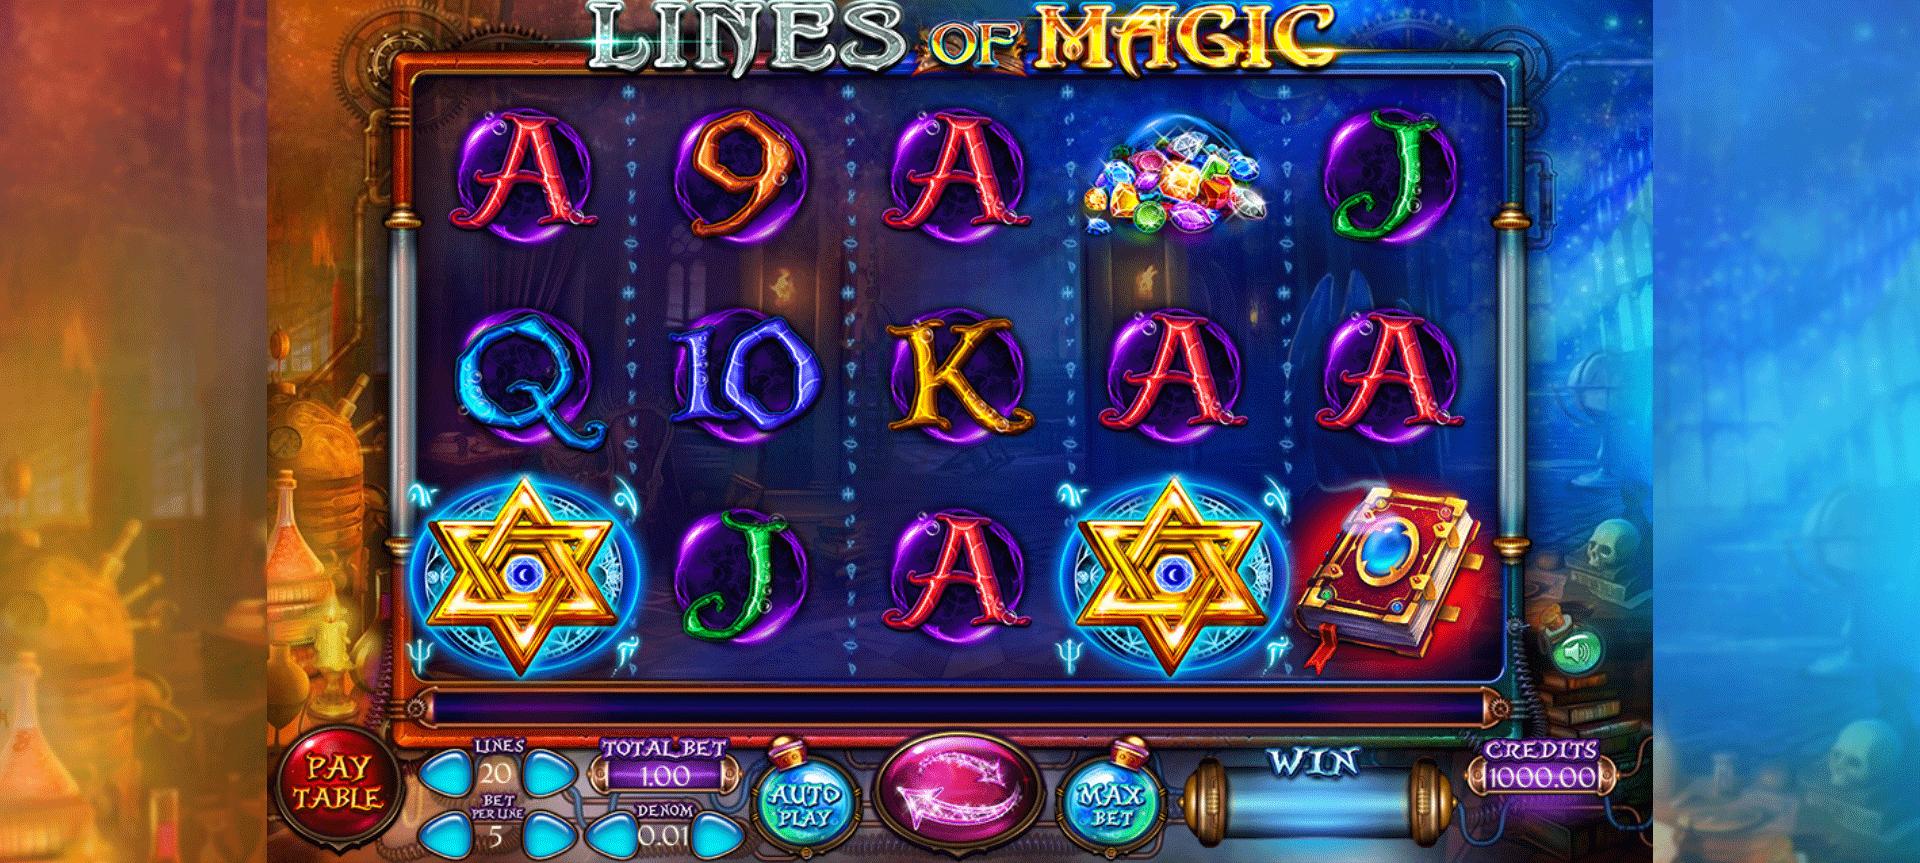 Slot Lines of Magic